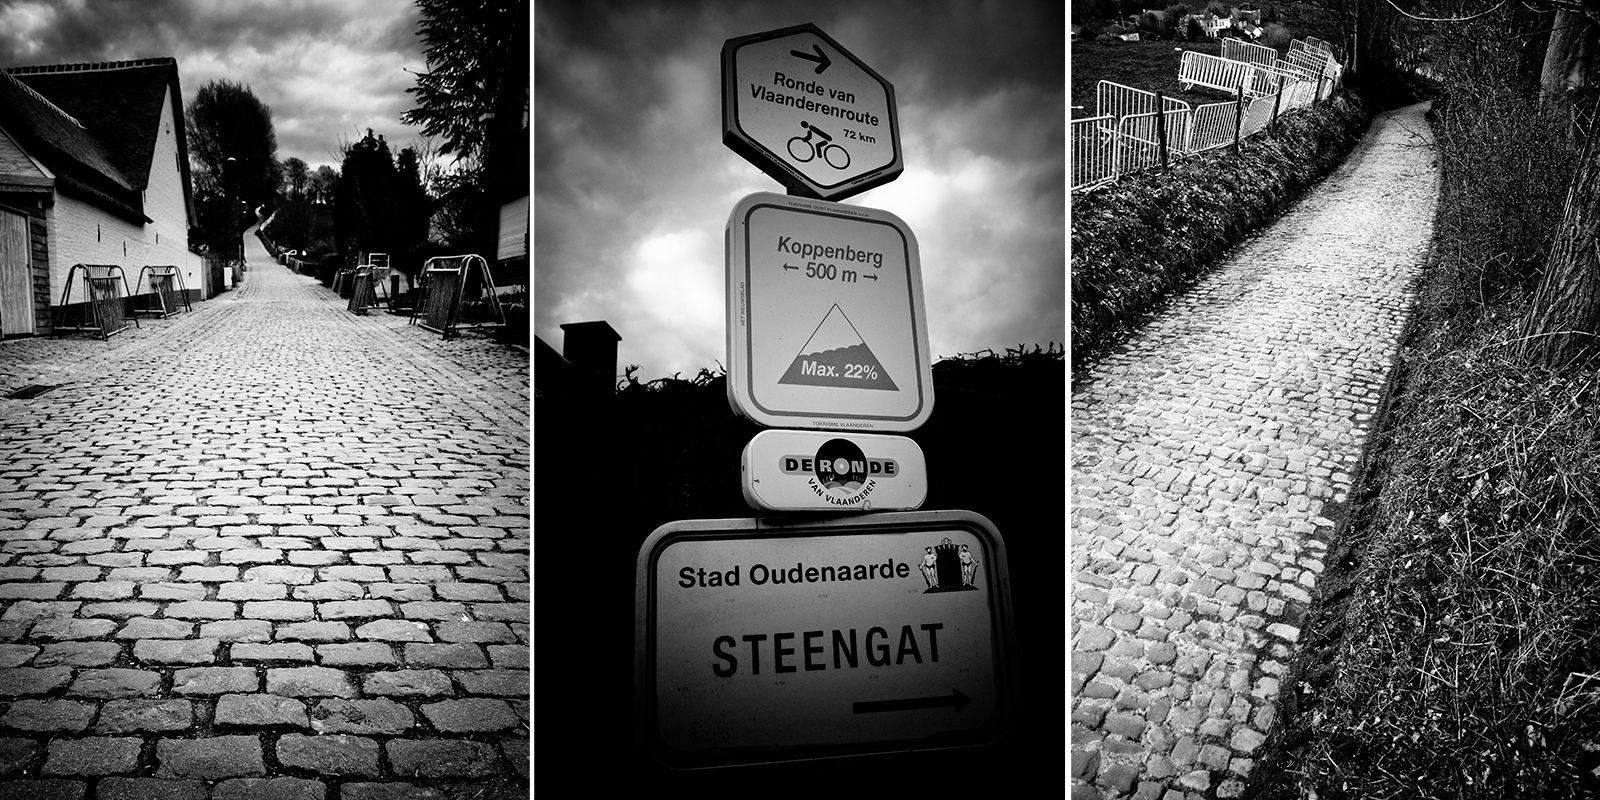 Koppenberg: Montagnes du monde #9